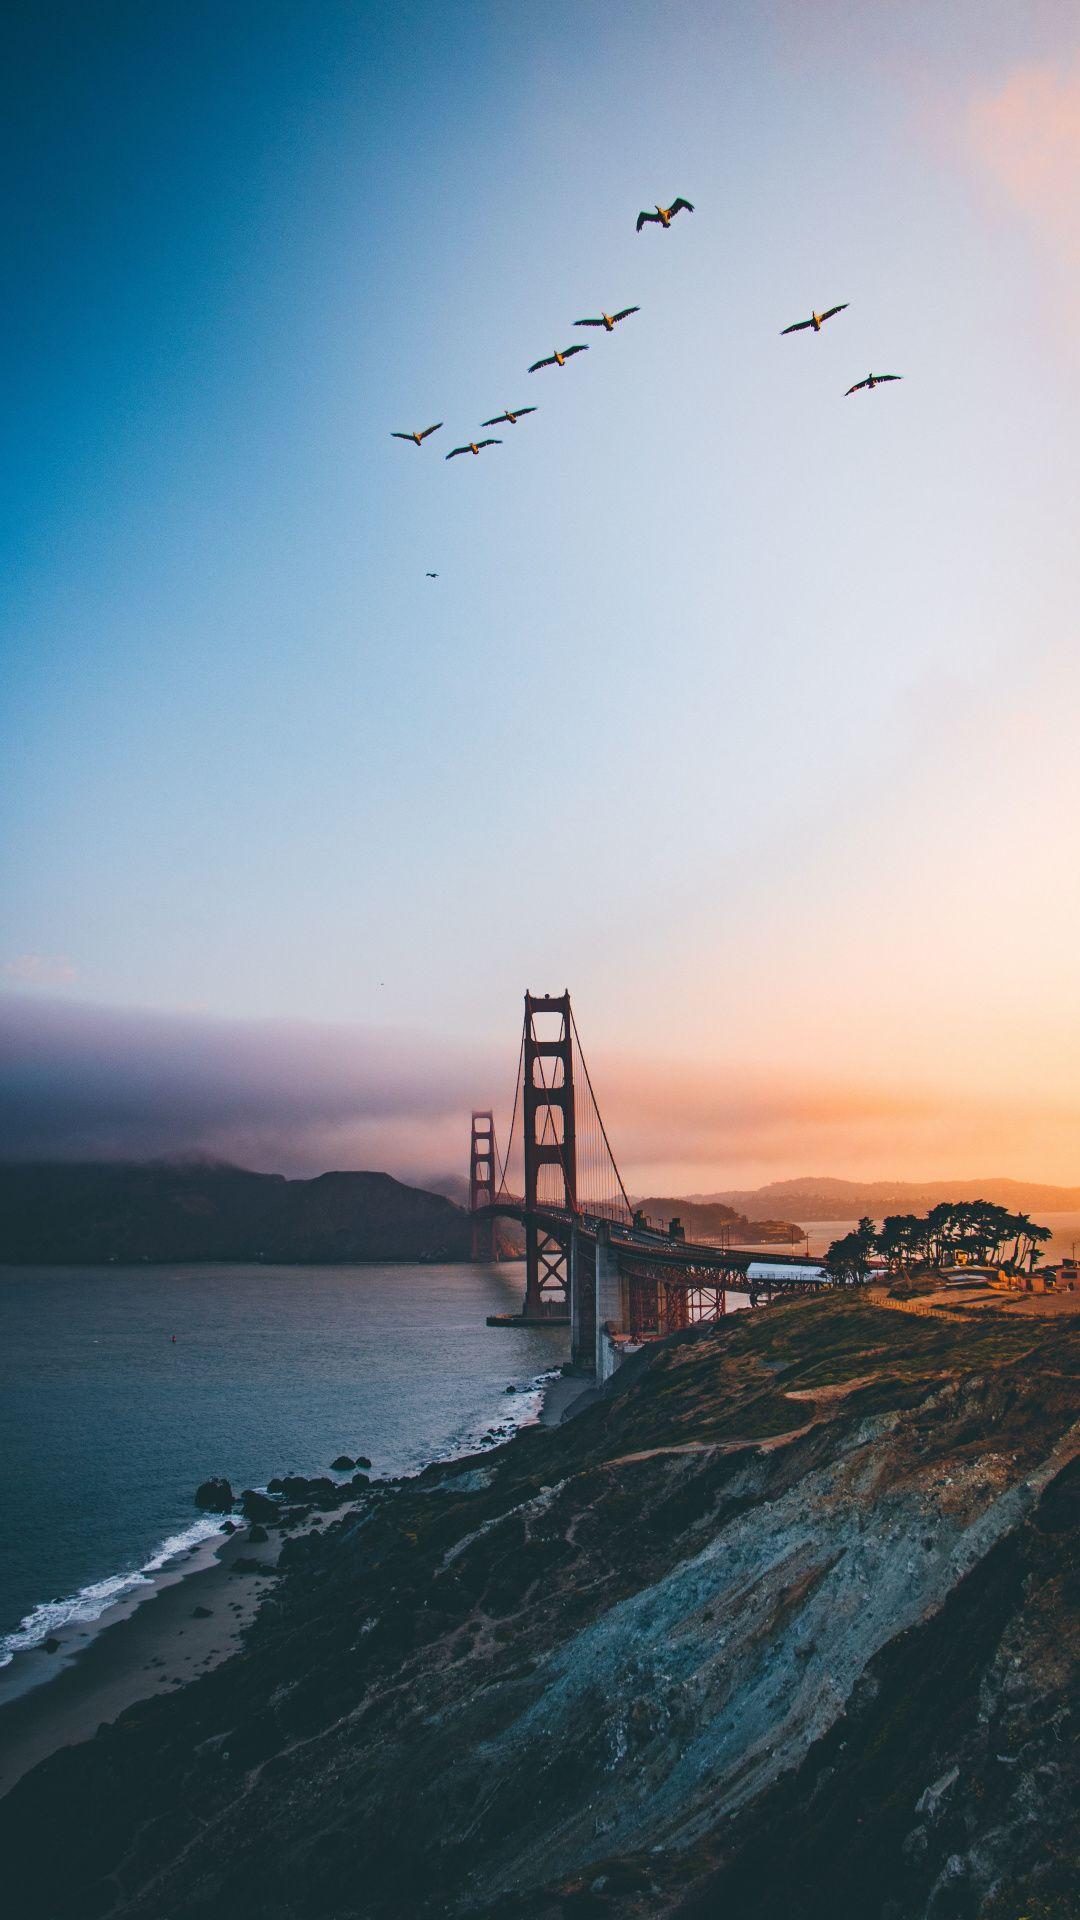 Golden Gate Bridge Sky Clean Sunset Iphone Wallpaper Travel Travel Wallpaper City Wallpaper